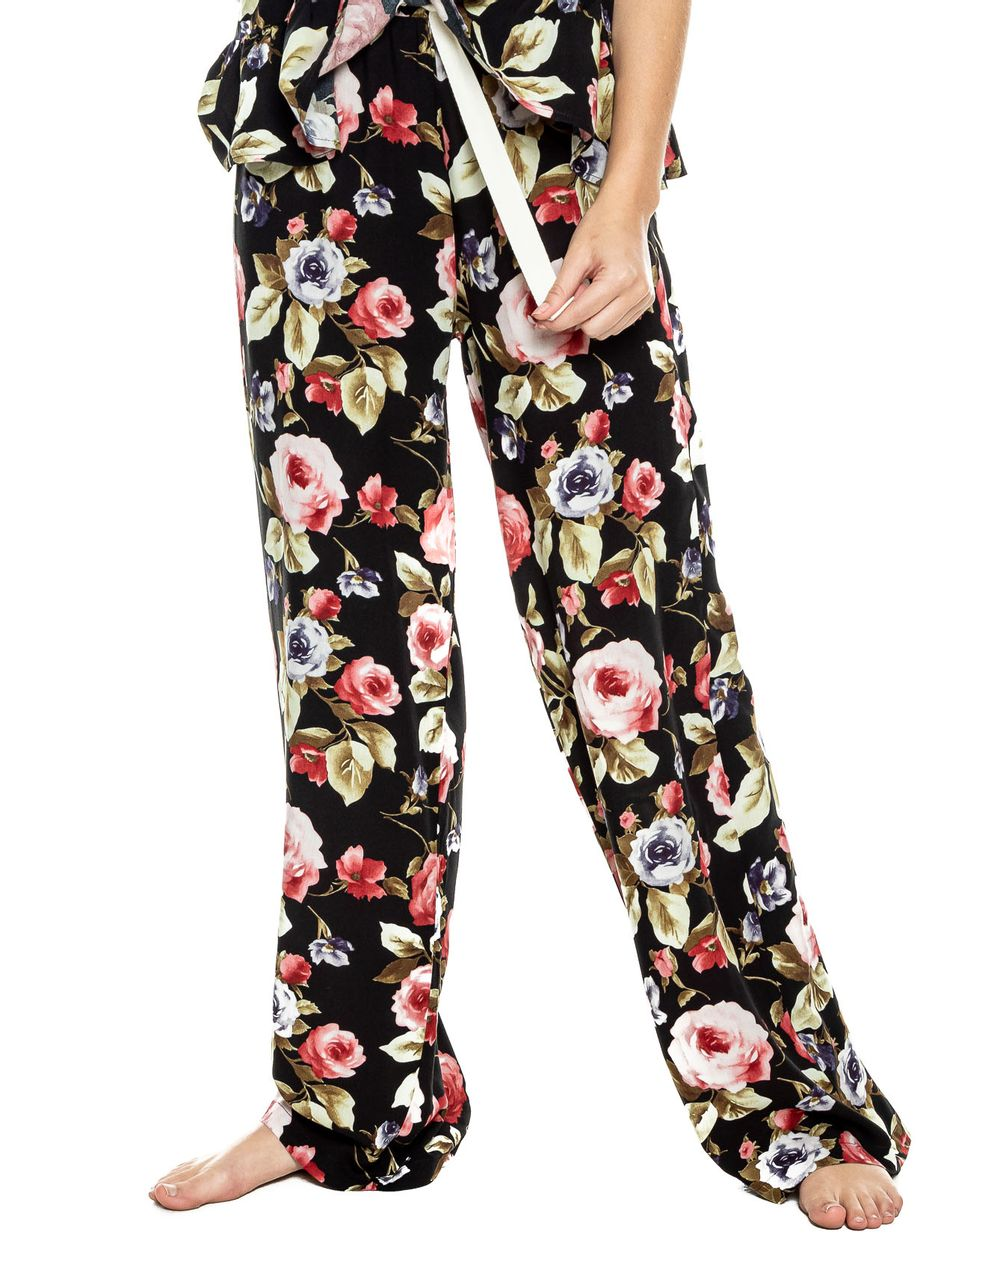 pantalon-046809-negro-1.jpg